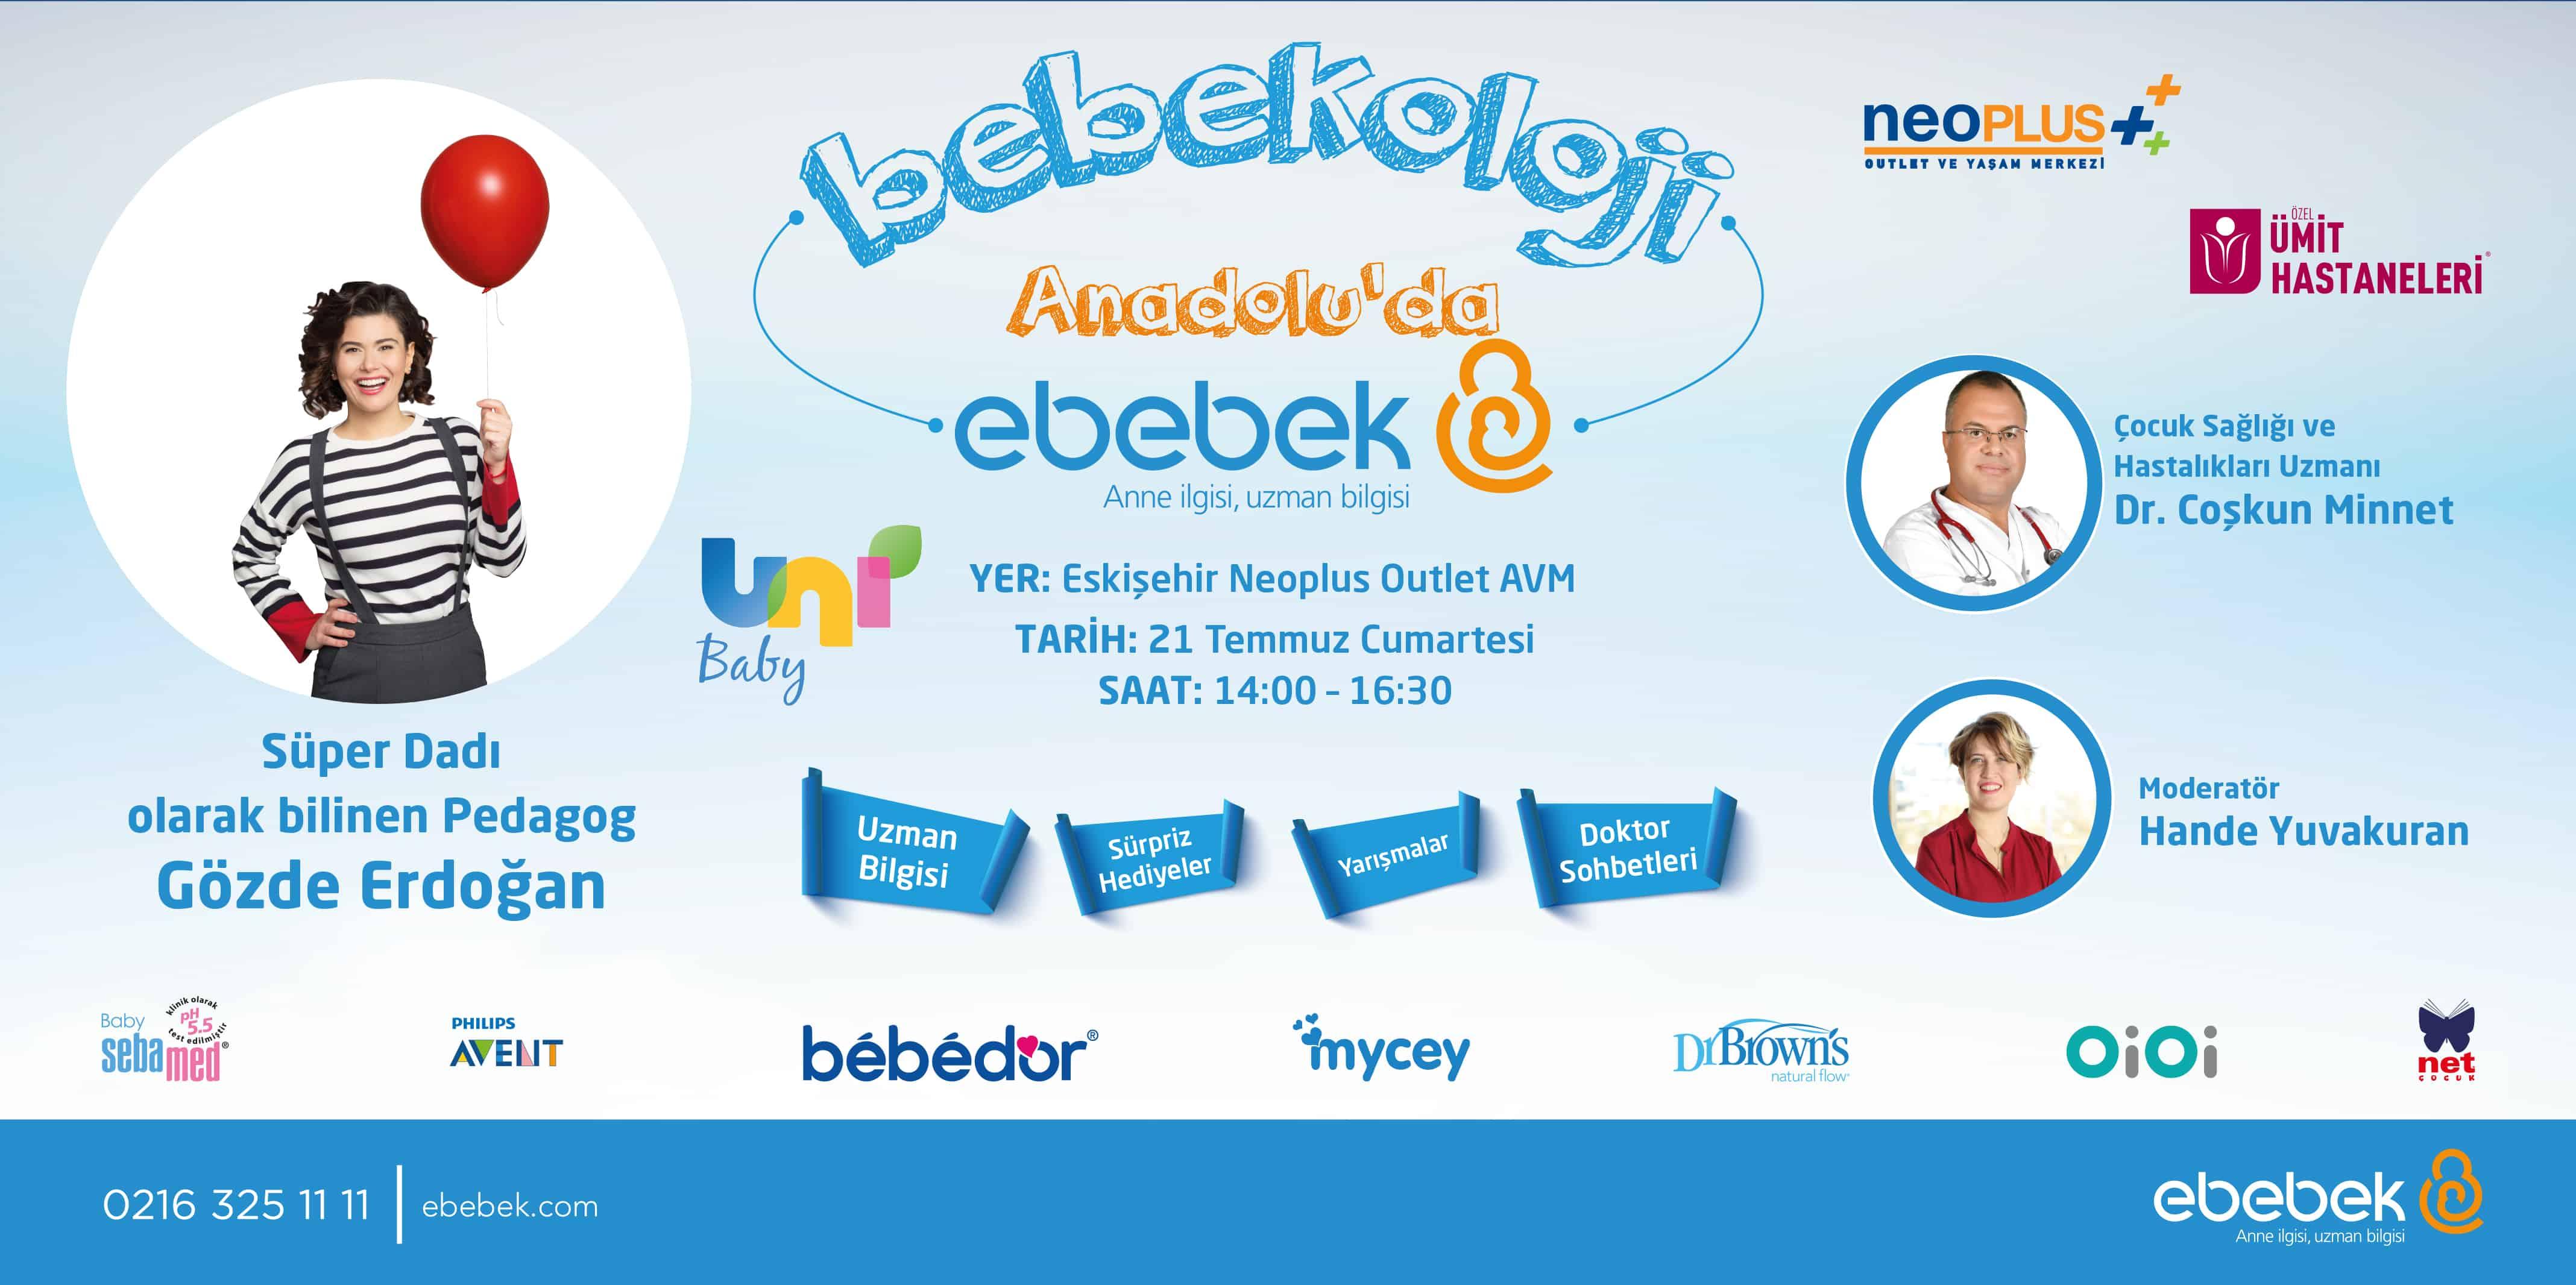 Photo of Bebekoloji Eskişehir'de!